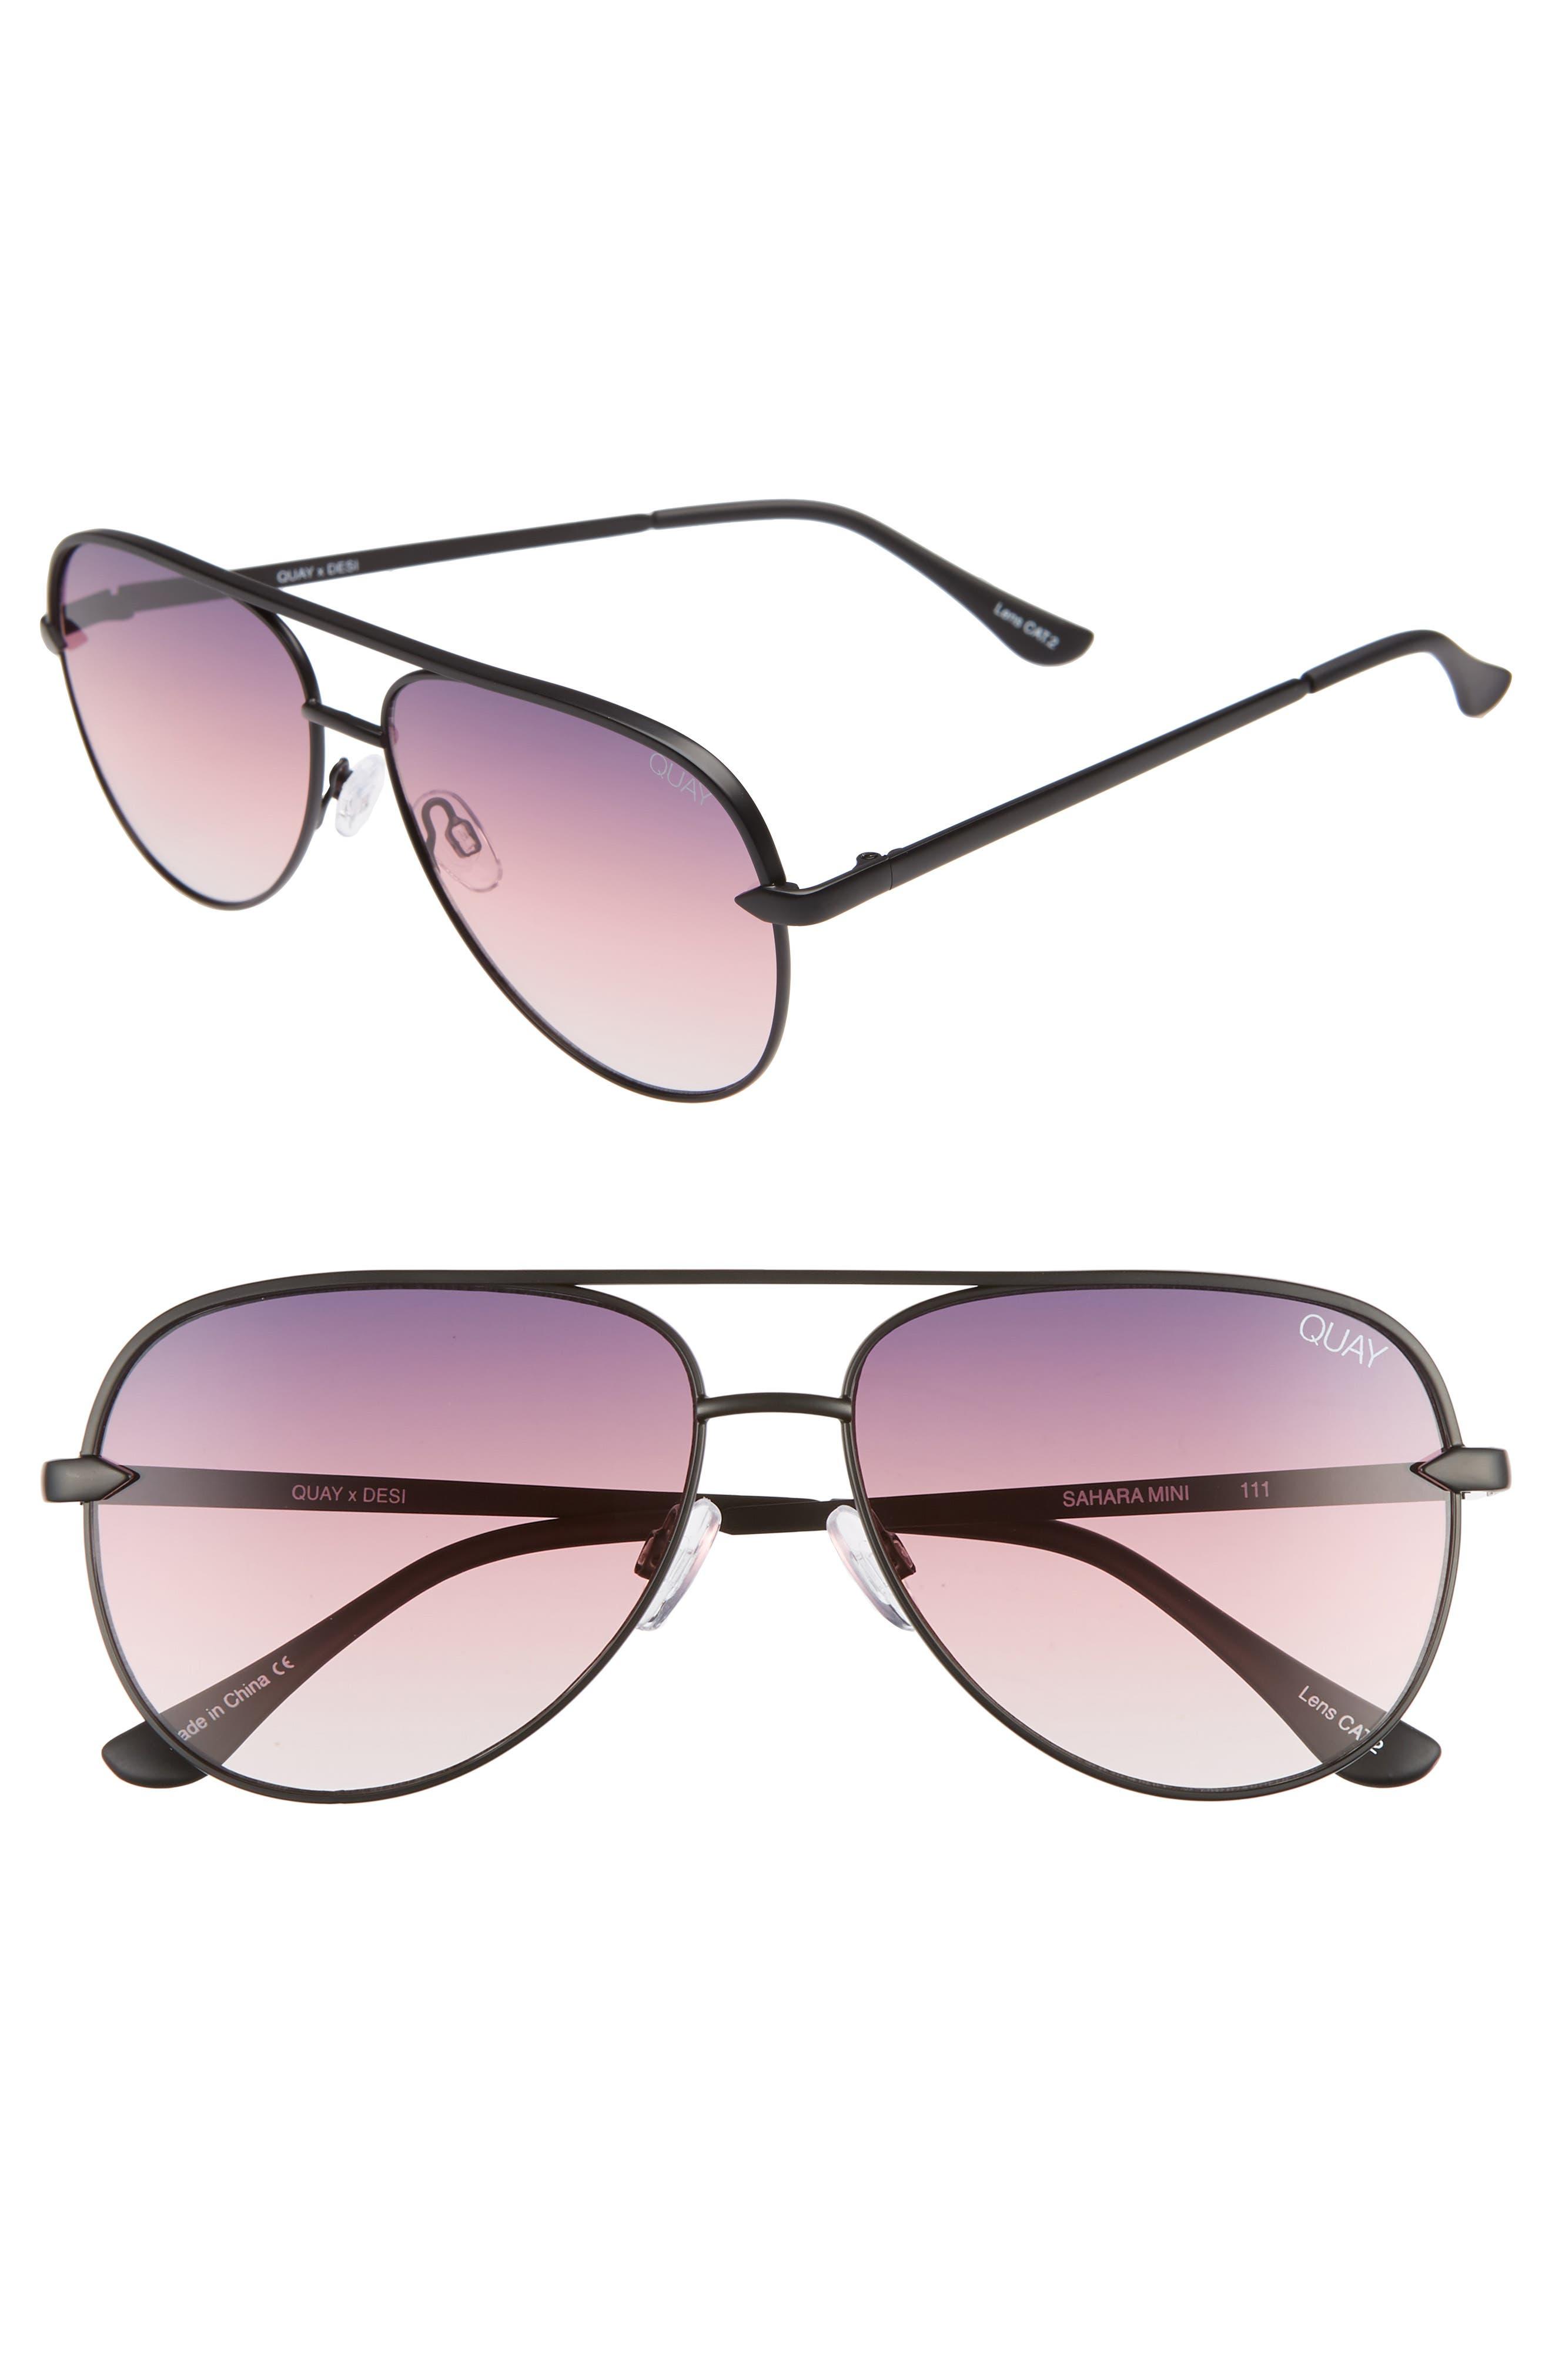 QUAY X Desi Perkins Sahara Mini 52Mm Aviator Sunglasses - Black/ Purple Fade